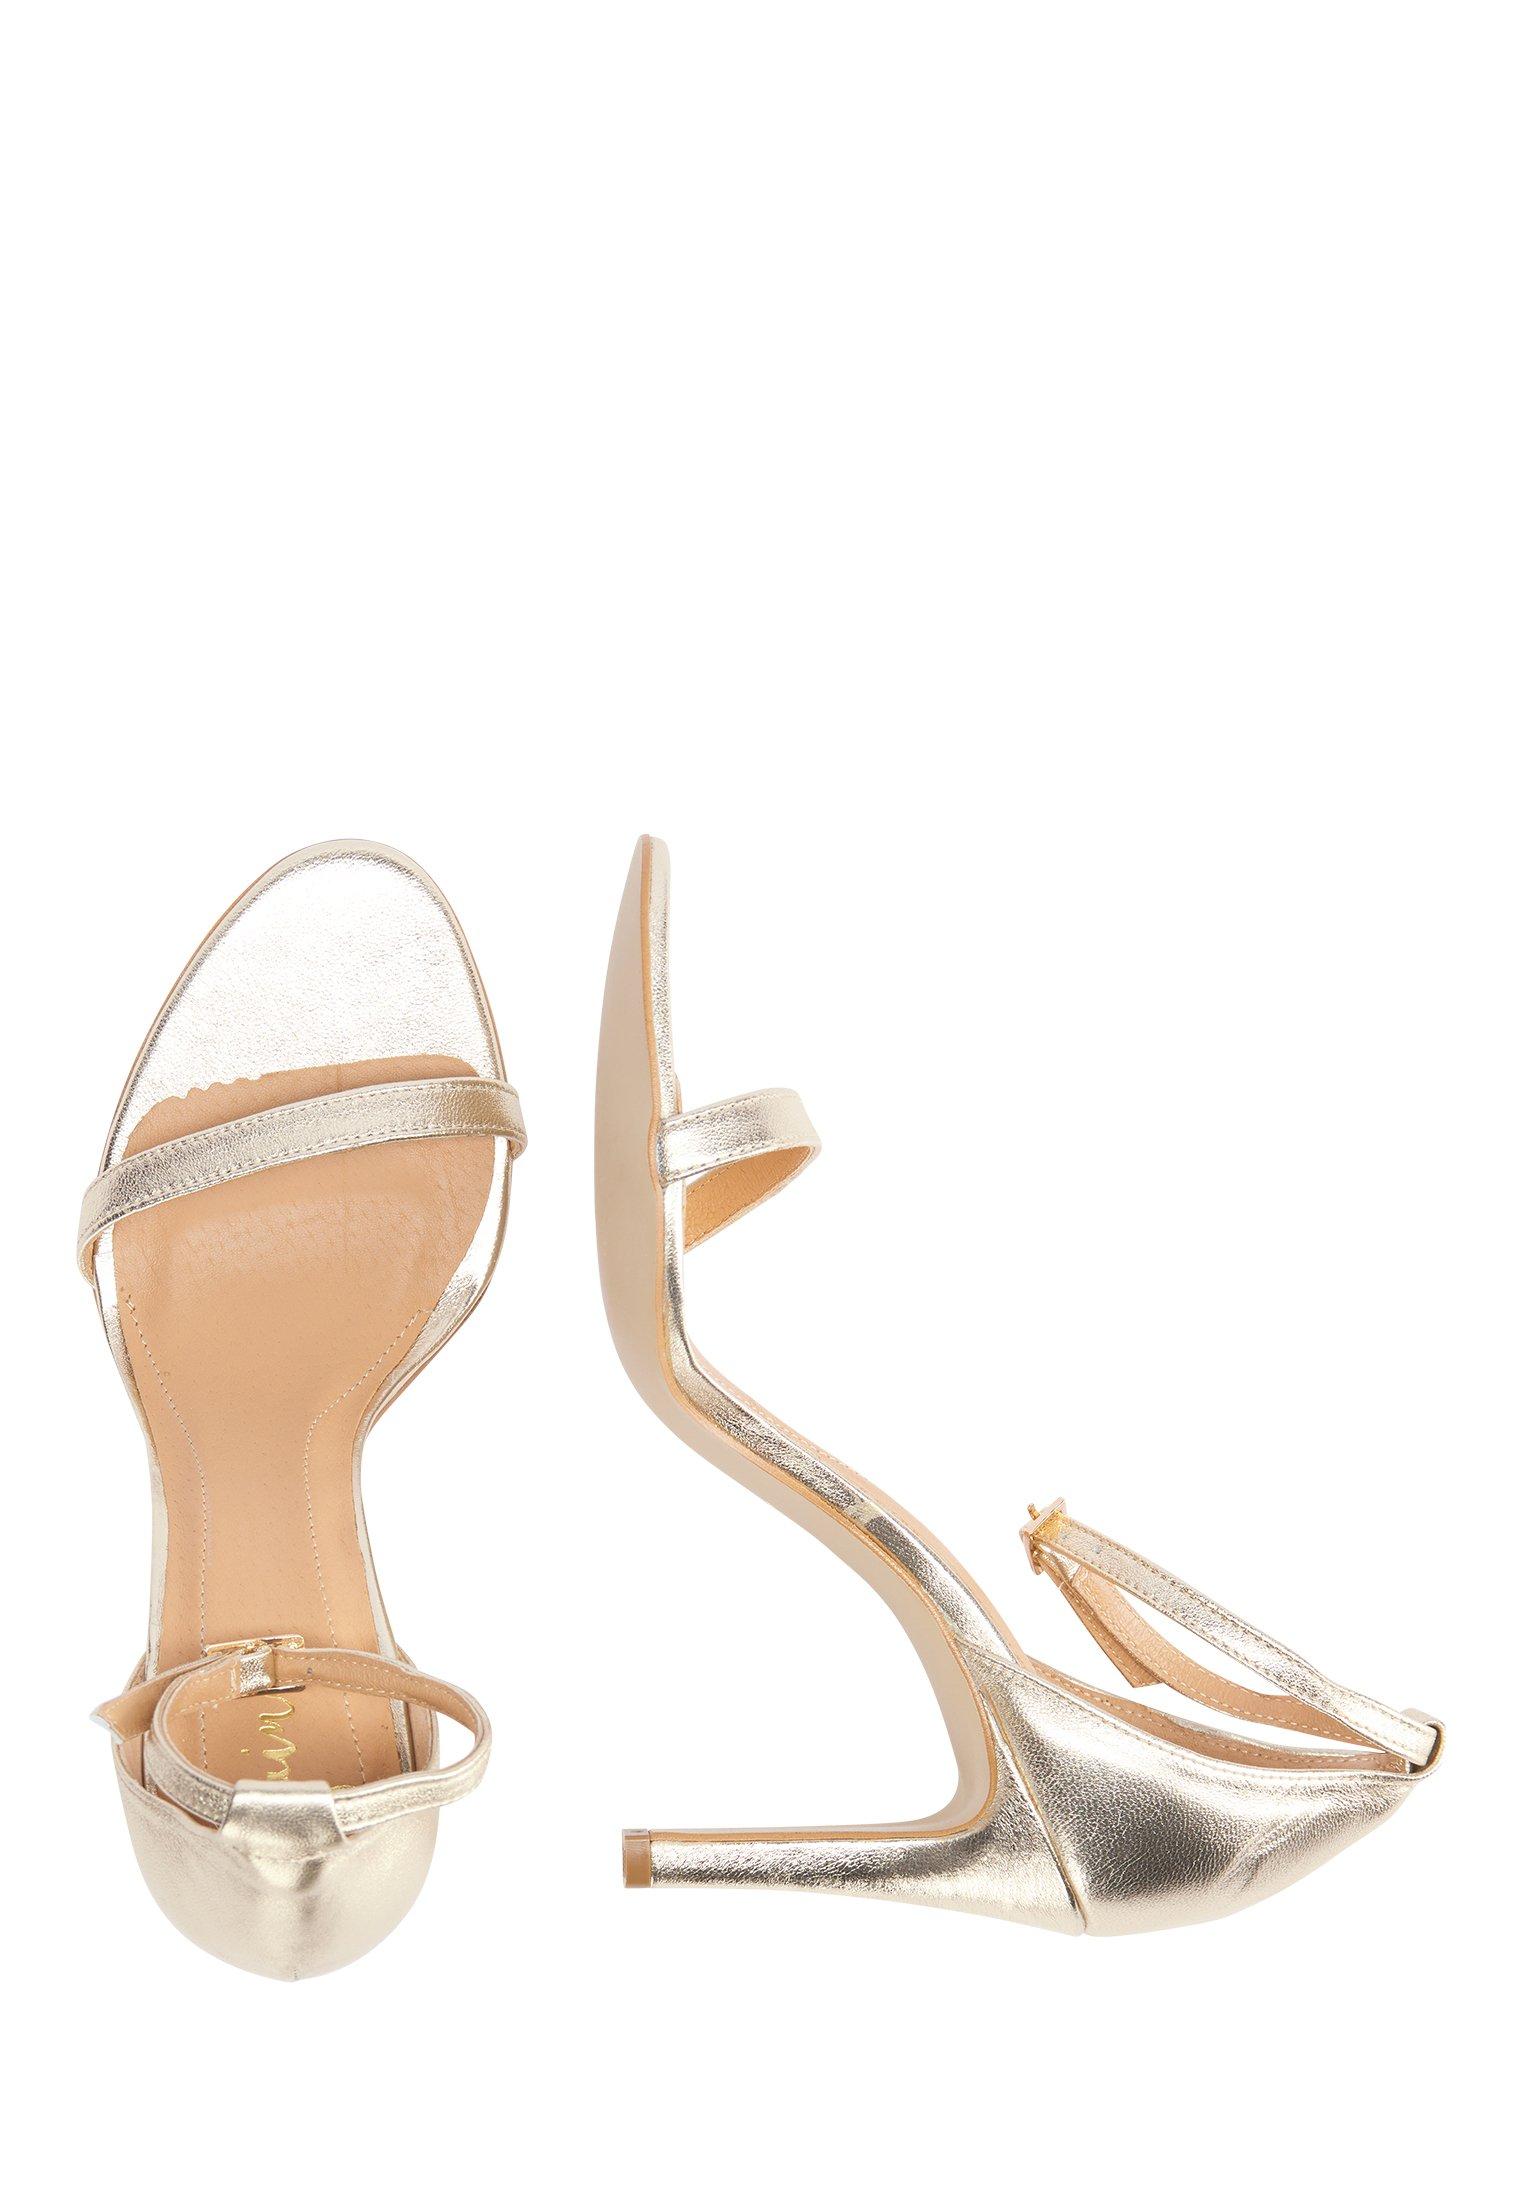 Faina High-heel-sandalette - Højhælede Sandaletter / Sandaler Gold